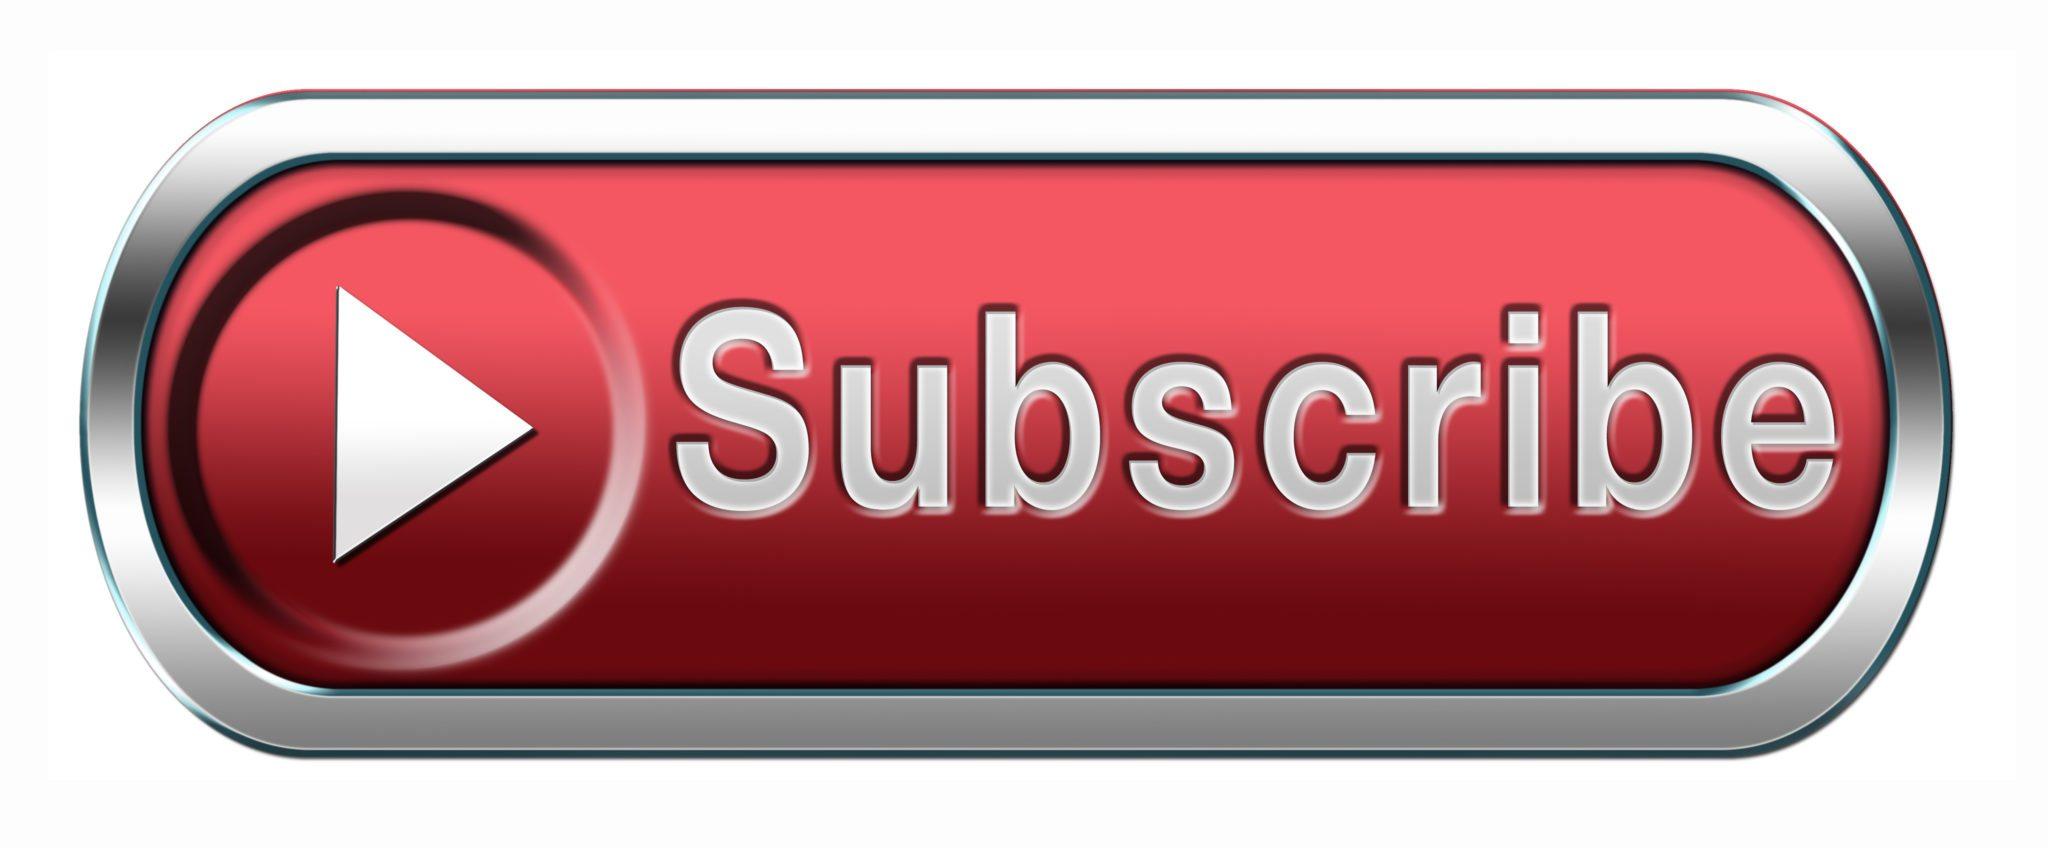 Subscription-button-AdobeStock_58527870.jpeg